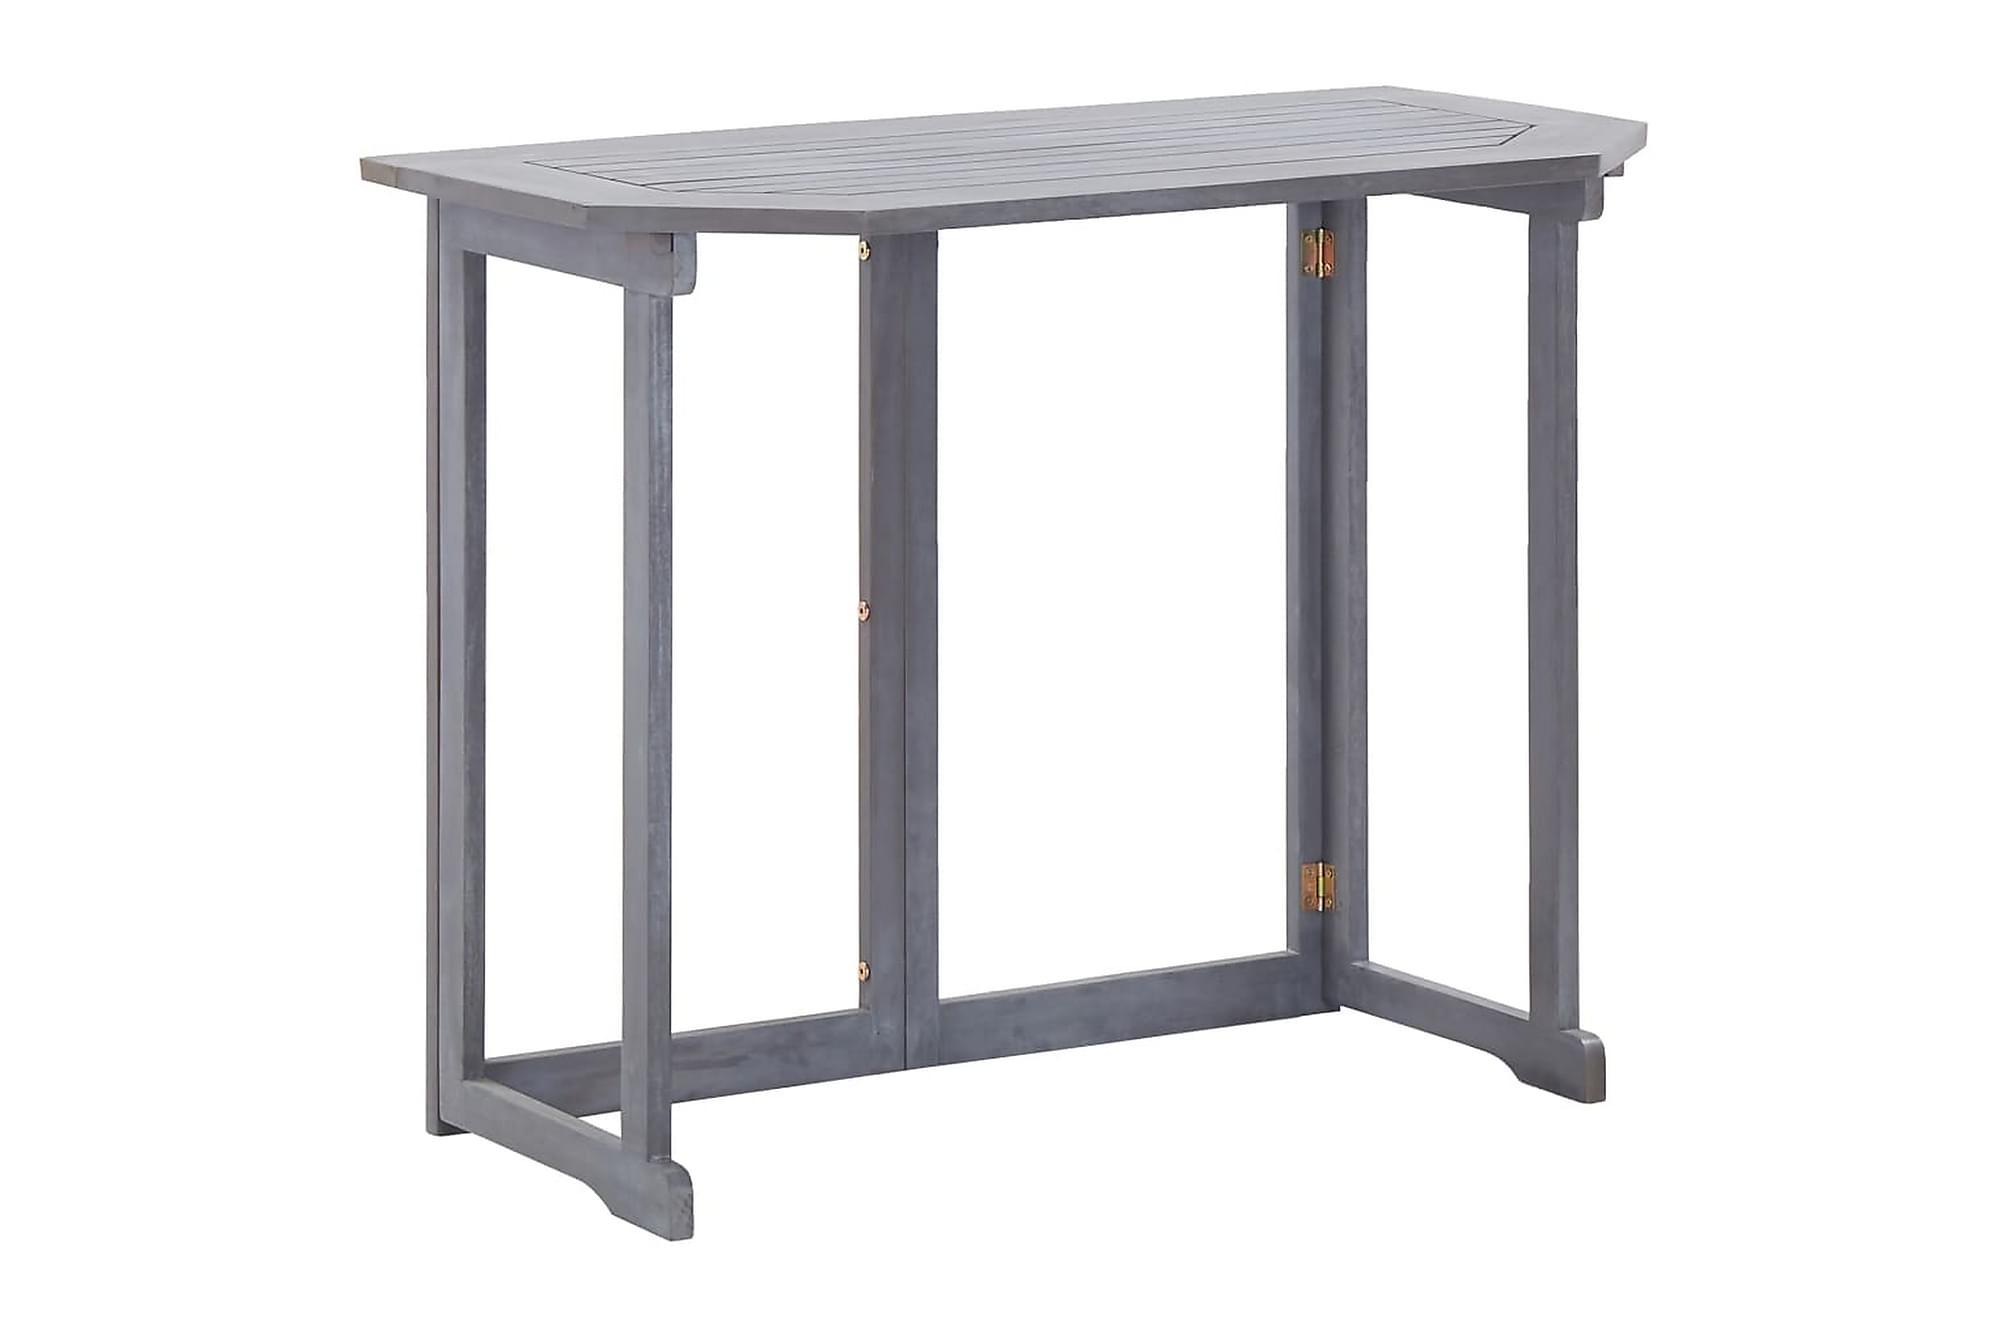 Hopfällbart balkongbord 120x70x74 cm massivt akaciaträ